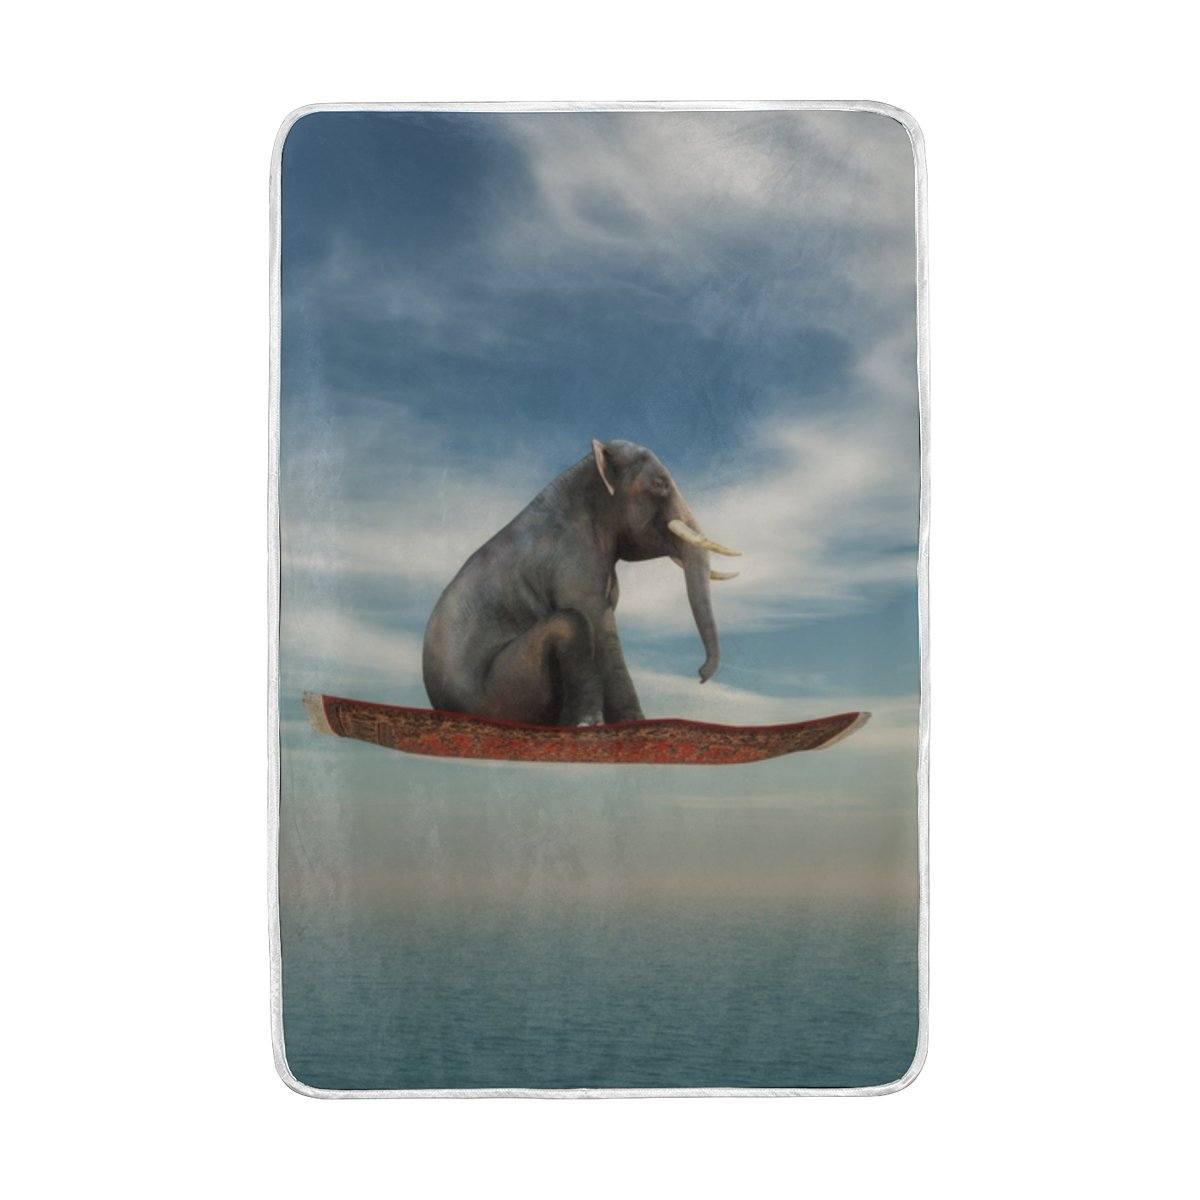 Vantaso Soft Blankets Throw India Elephant On Flying Carpet for Kids Girls Boys Bedroom Sofa Couch Living Room 60 x 90 inch